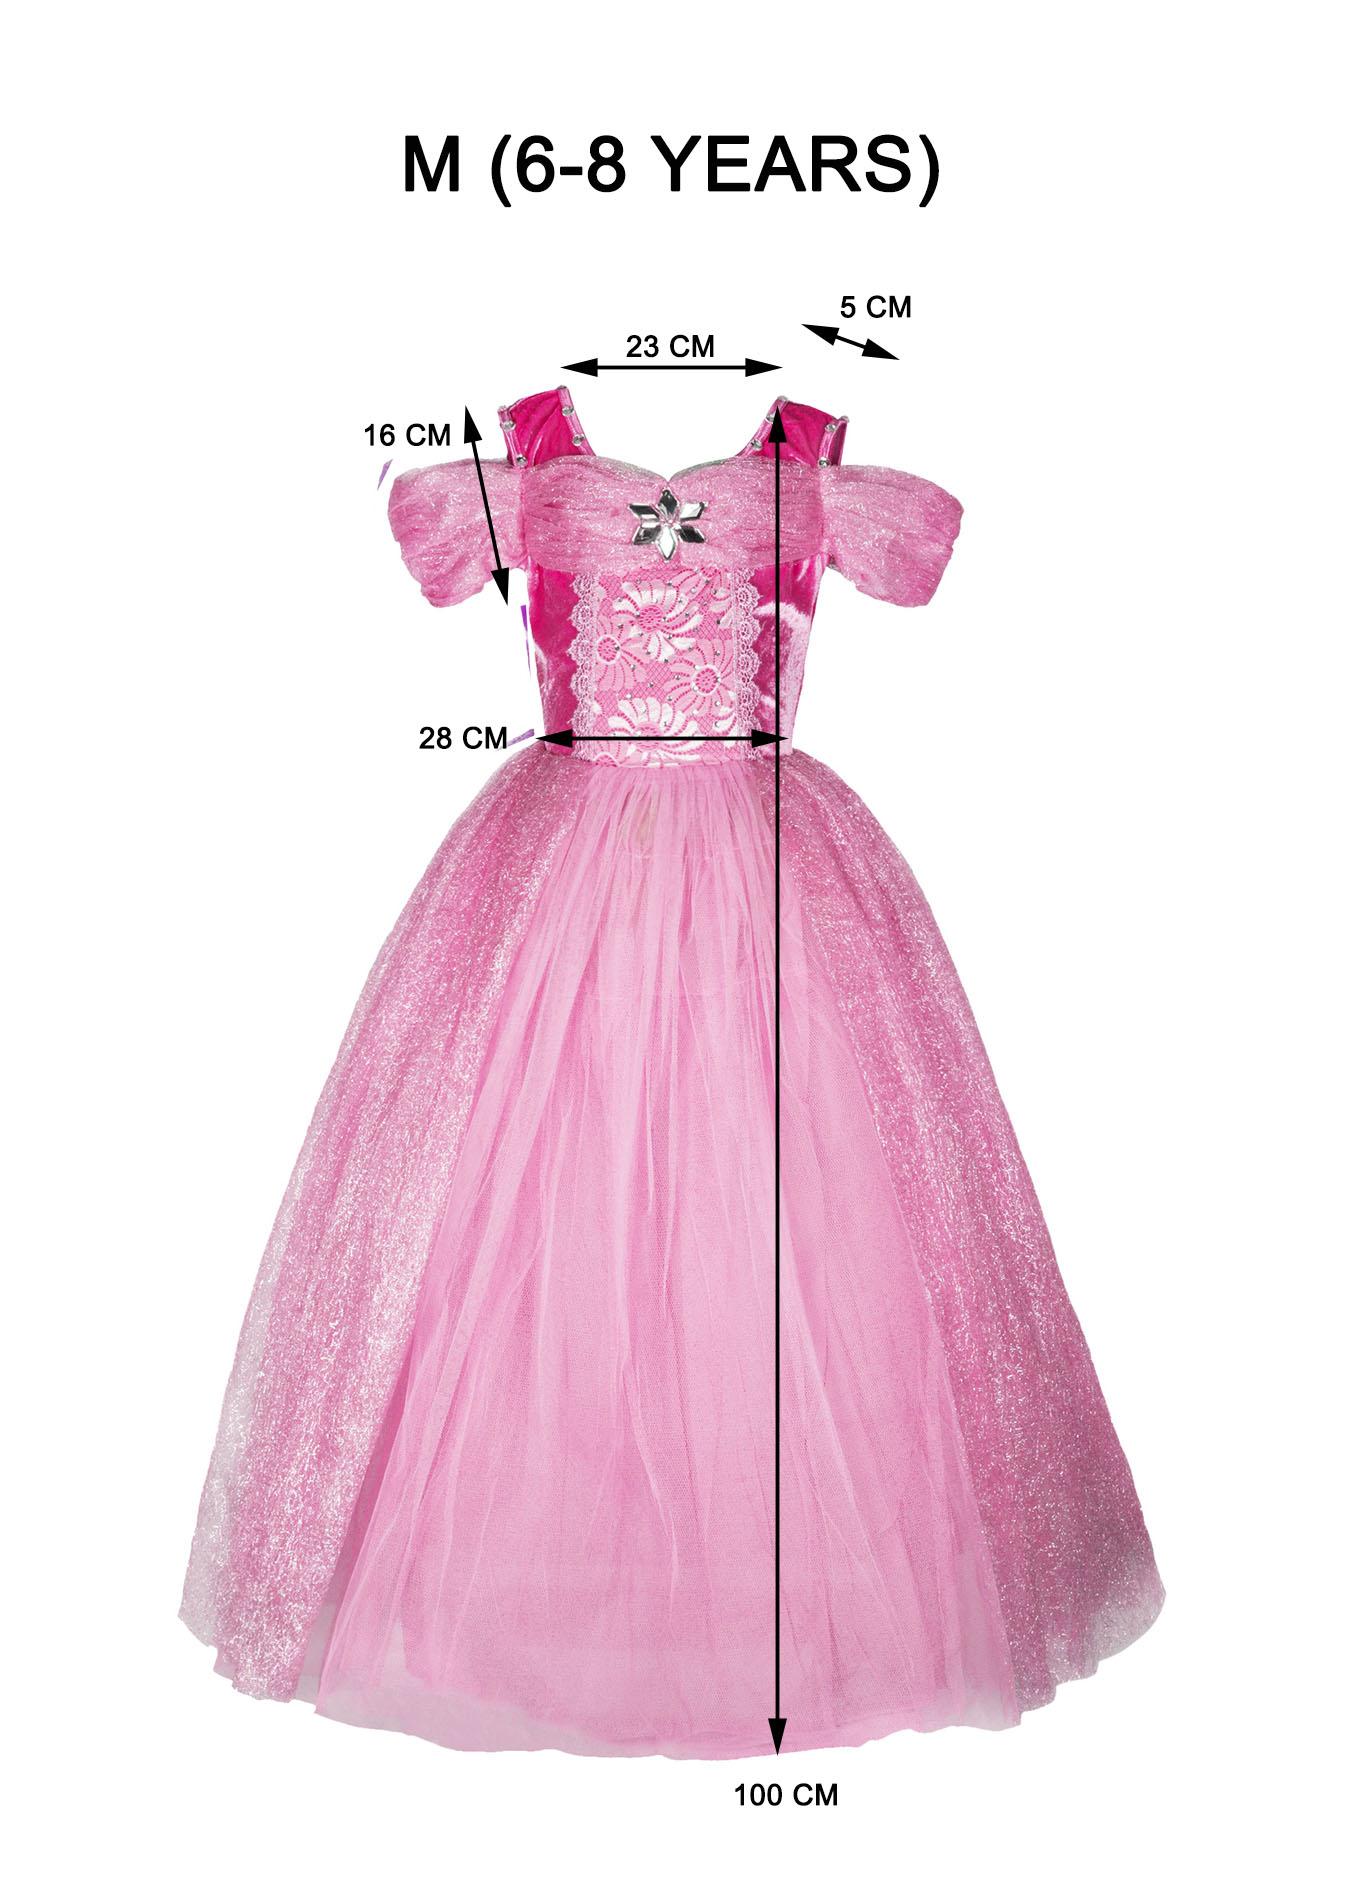 Sparkly Princess Pink M.jpg